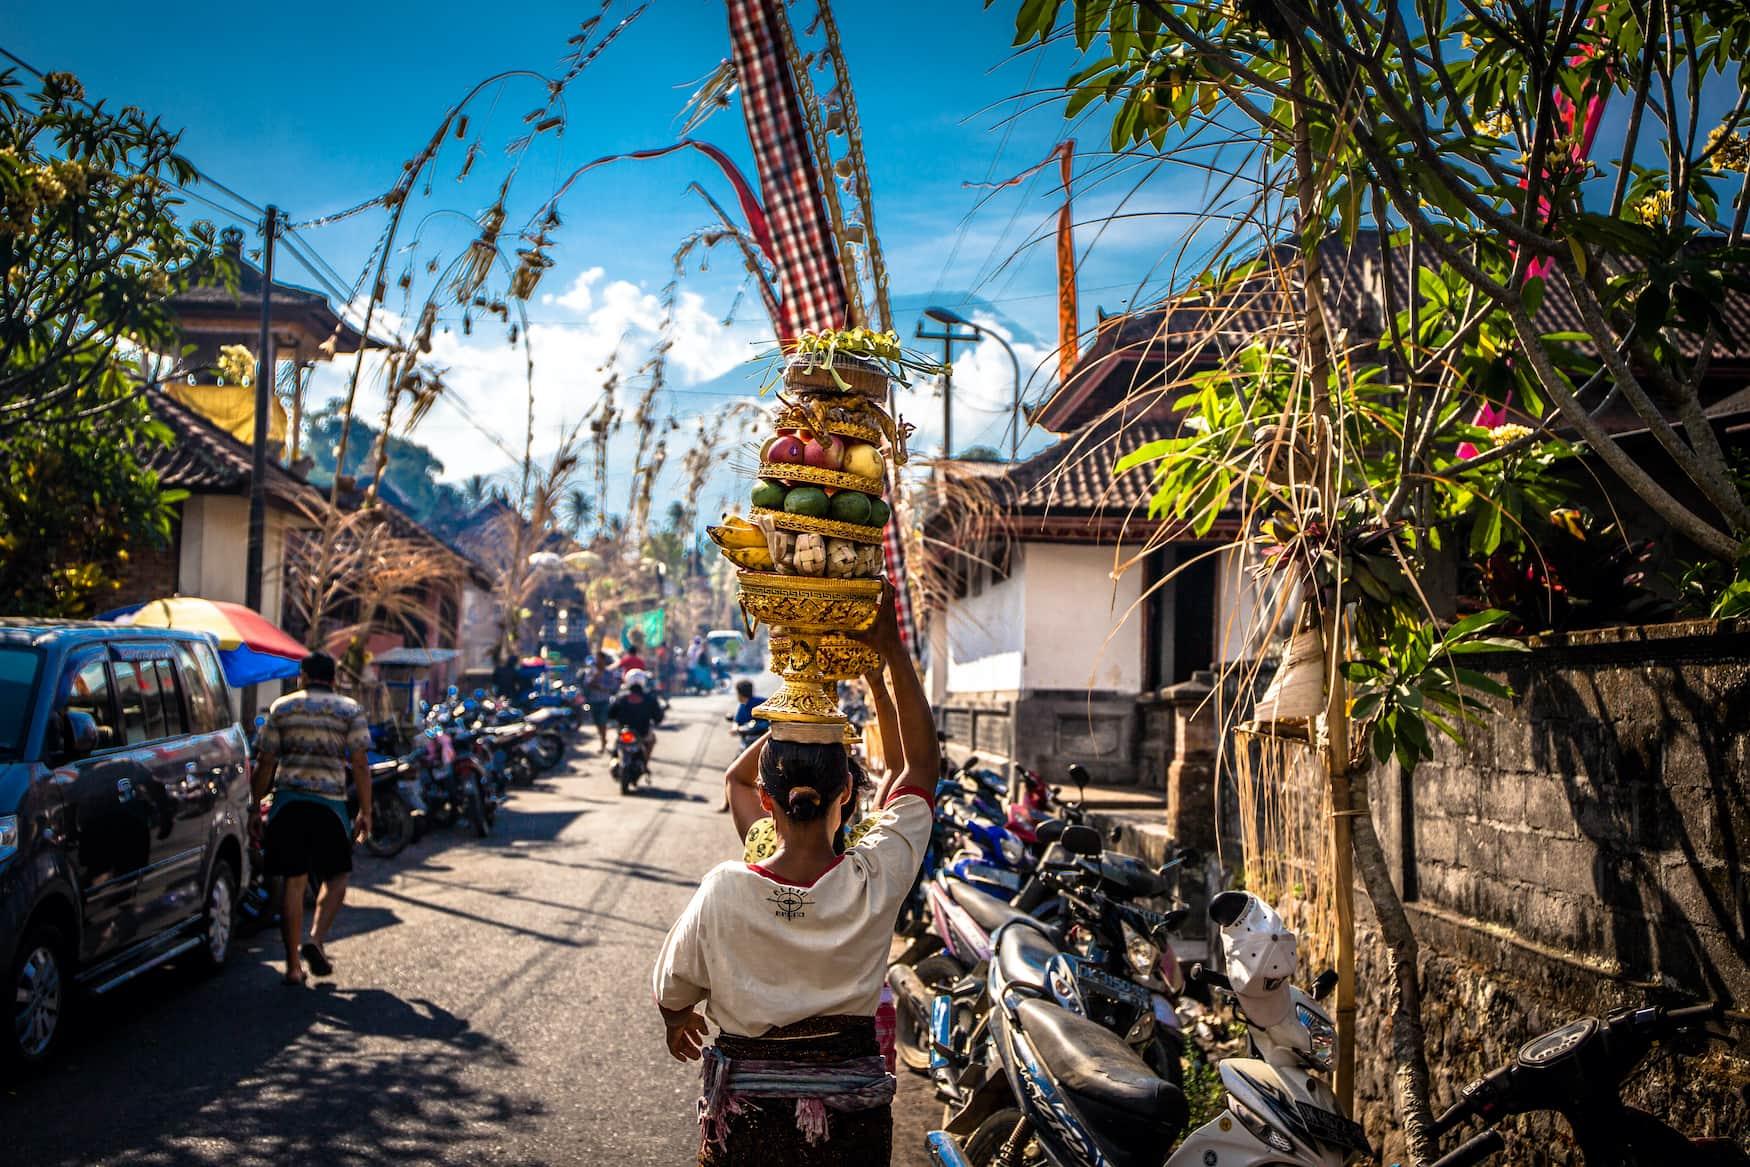 Frau trägt Lebensmittel auf dem Kopf in Dorf auf Bali